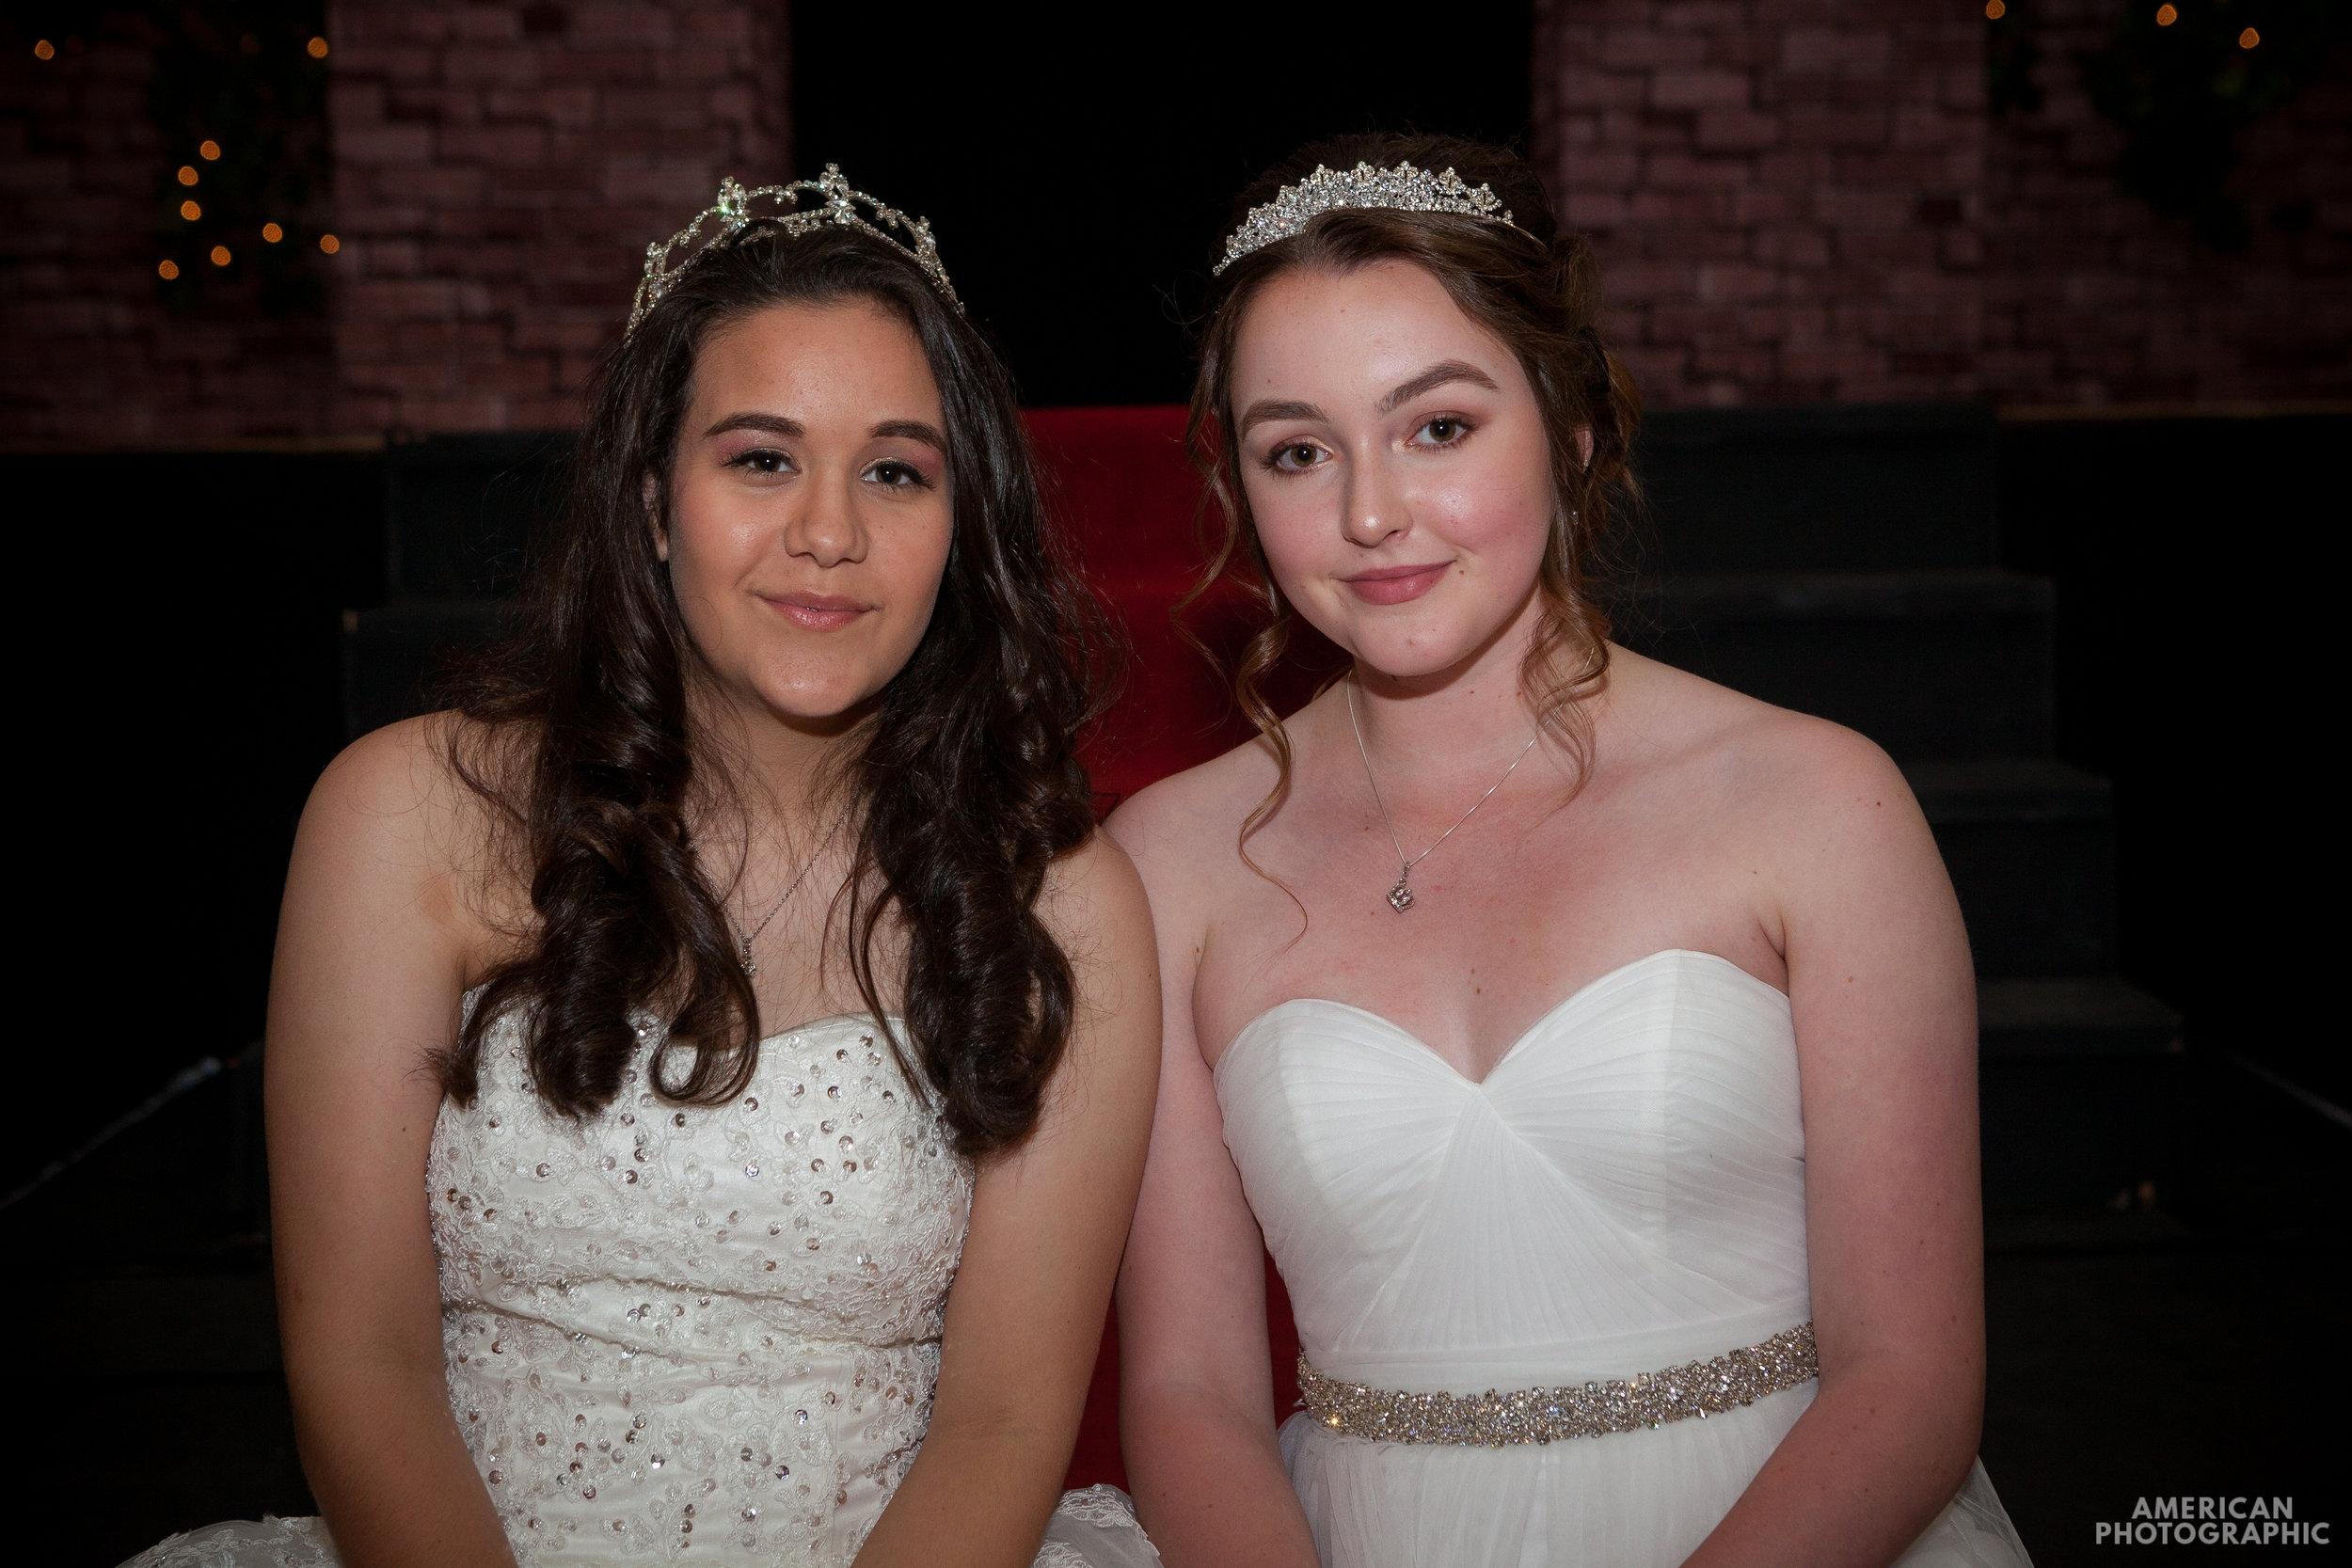 2017 Festival Queen - Lauren Coulthard (Left) and Honor Maid - Paula Raeside (Right)